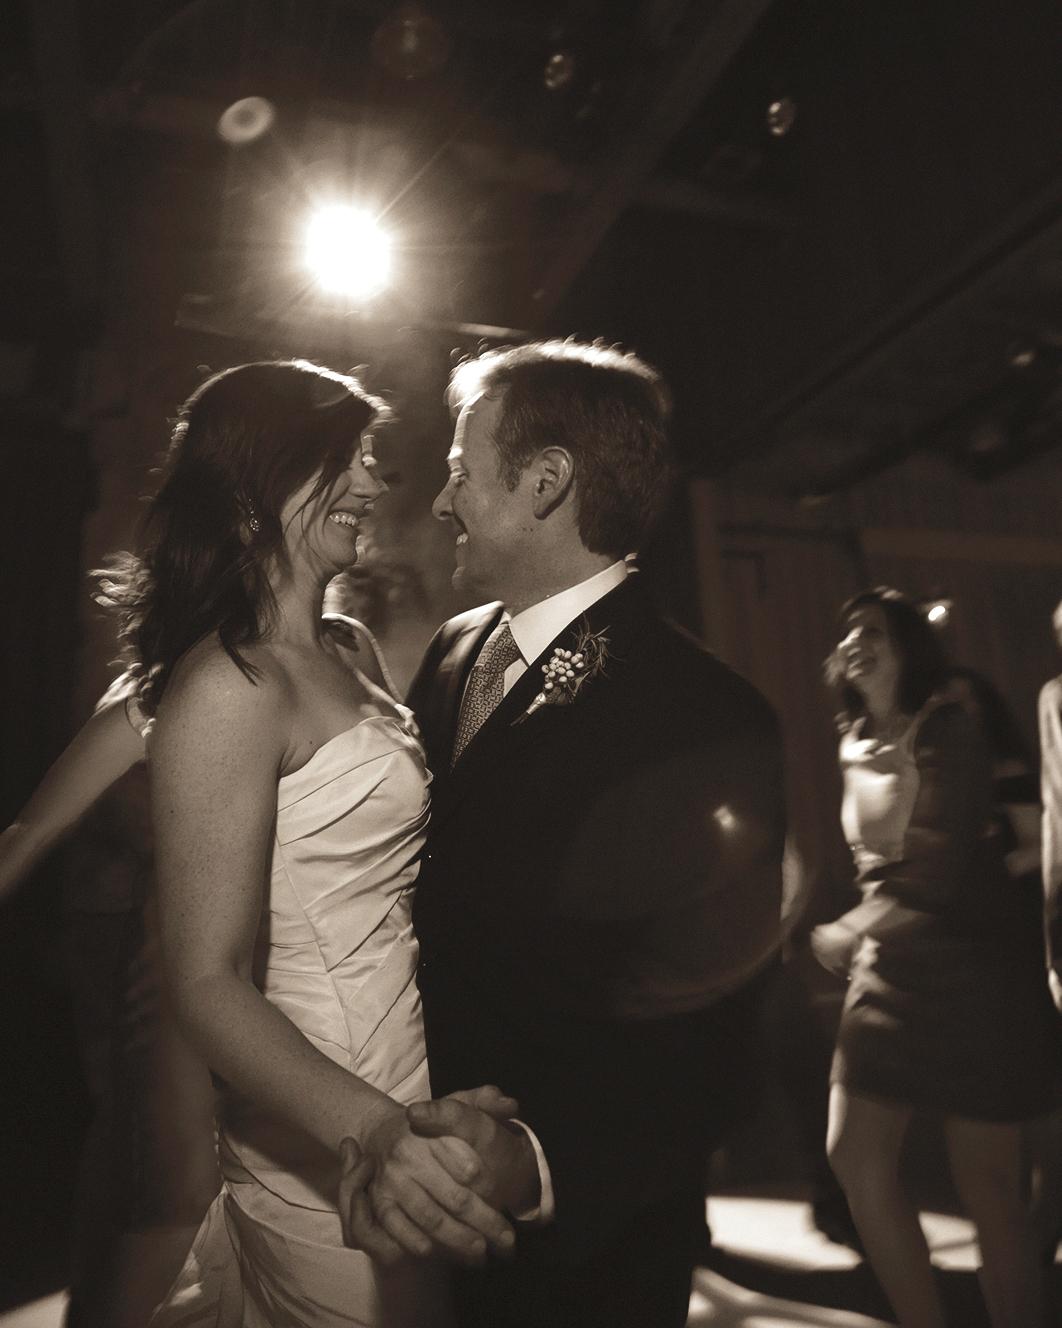 wedding-cover-bands-michael-lucarelli-0814.jpg